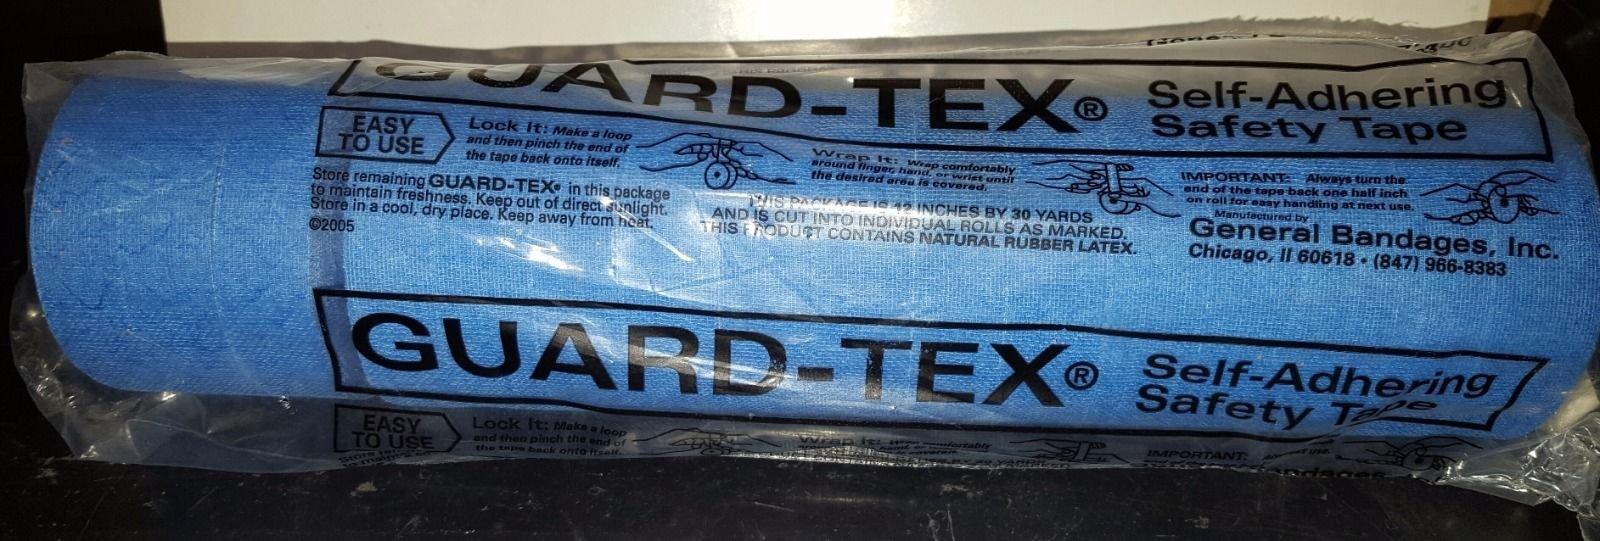 Guard-Tex ® Self-Adhering Safety Tape - General Bandage 3/4'' X 30 Yard Blue Guard-Tex ® Self-Adhering Safety Tape - 41408-3/4